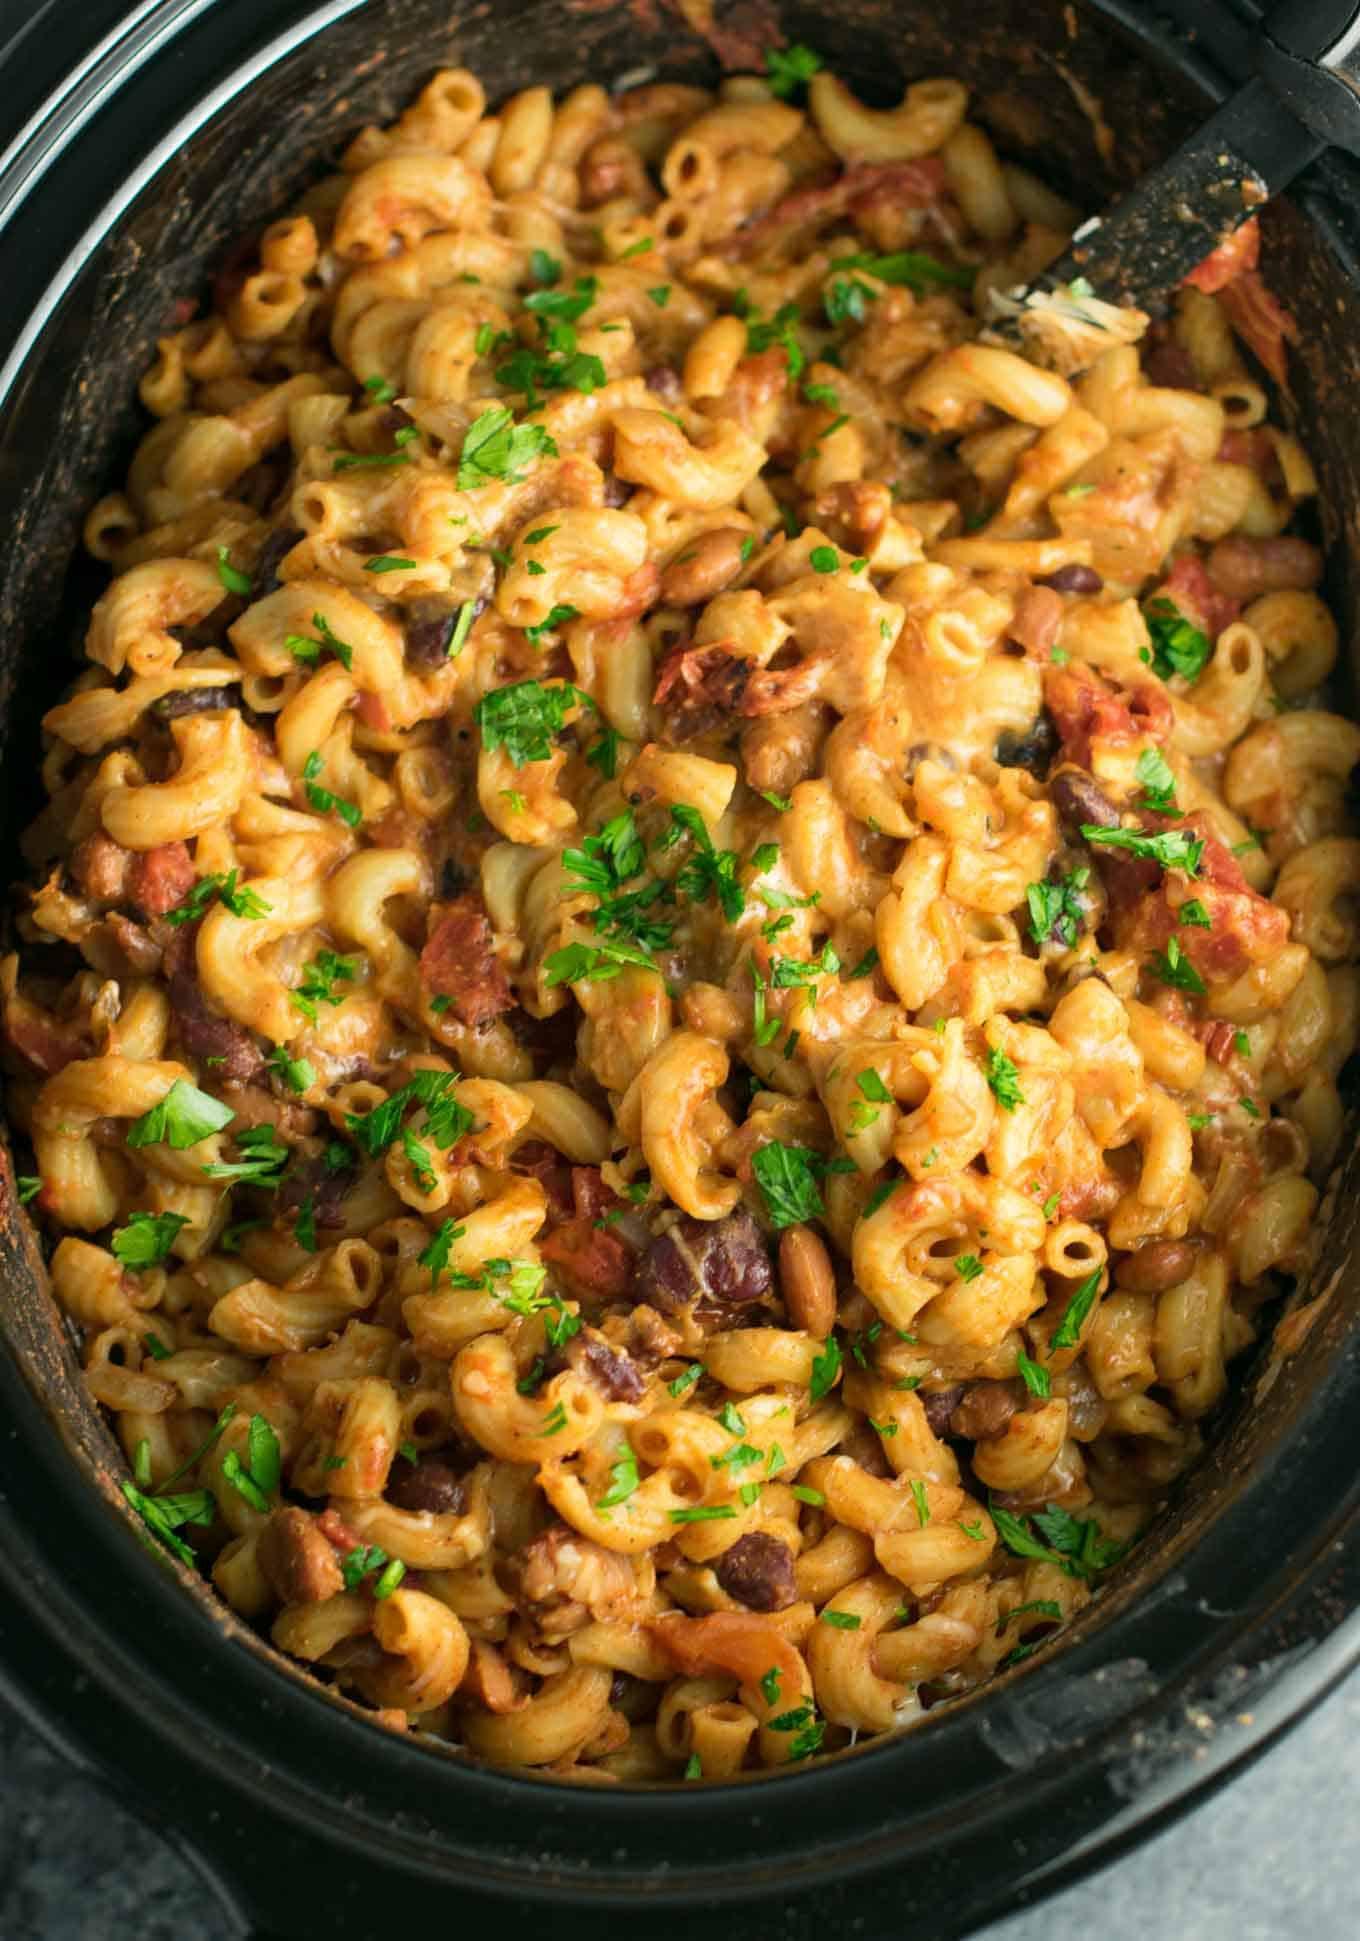 Vegetarian Crockpot Recipes  Slow Cooker Ve arian Chili Mac Recipe Build Your Bite